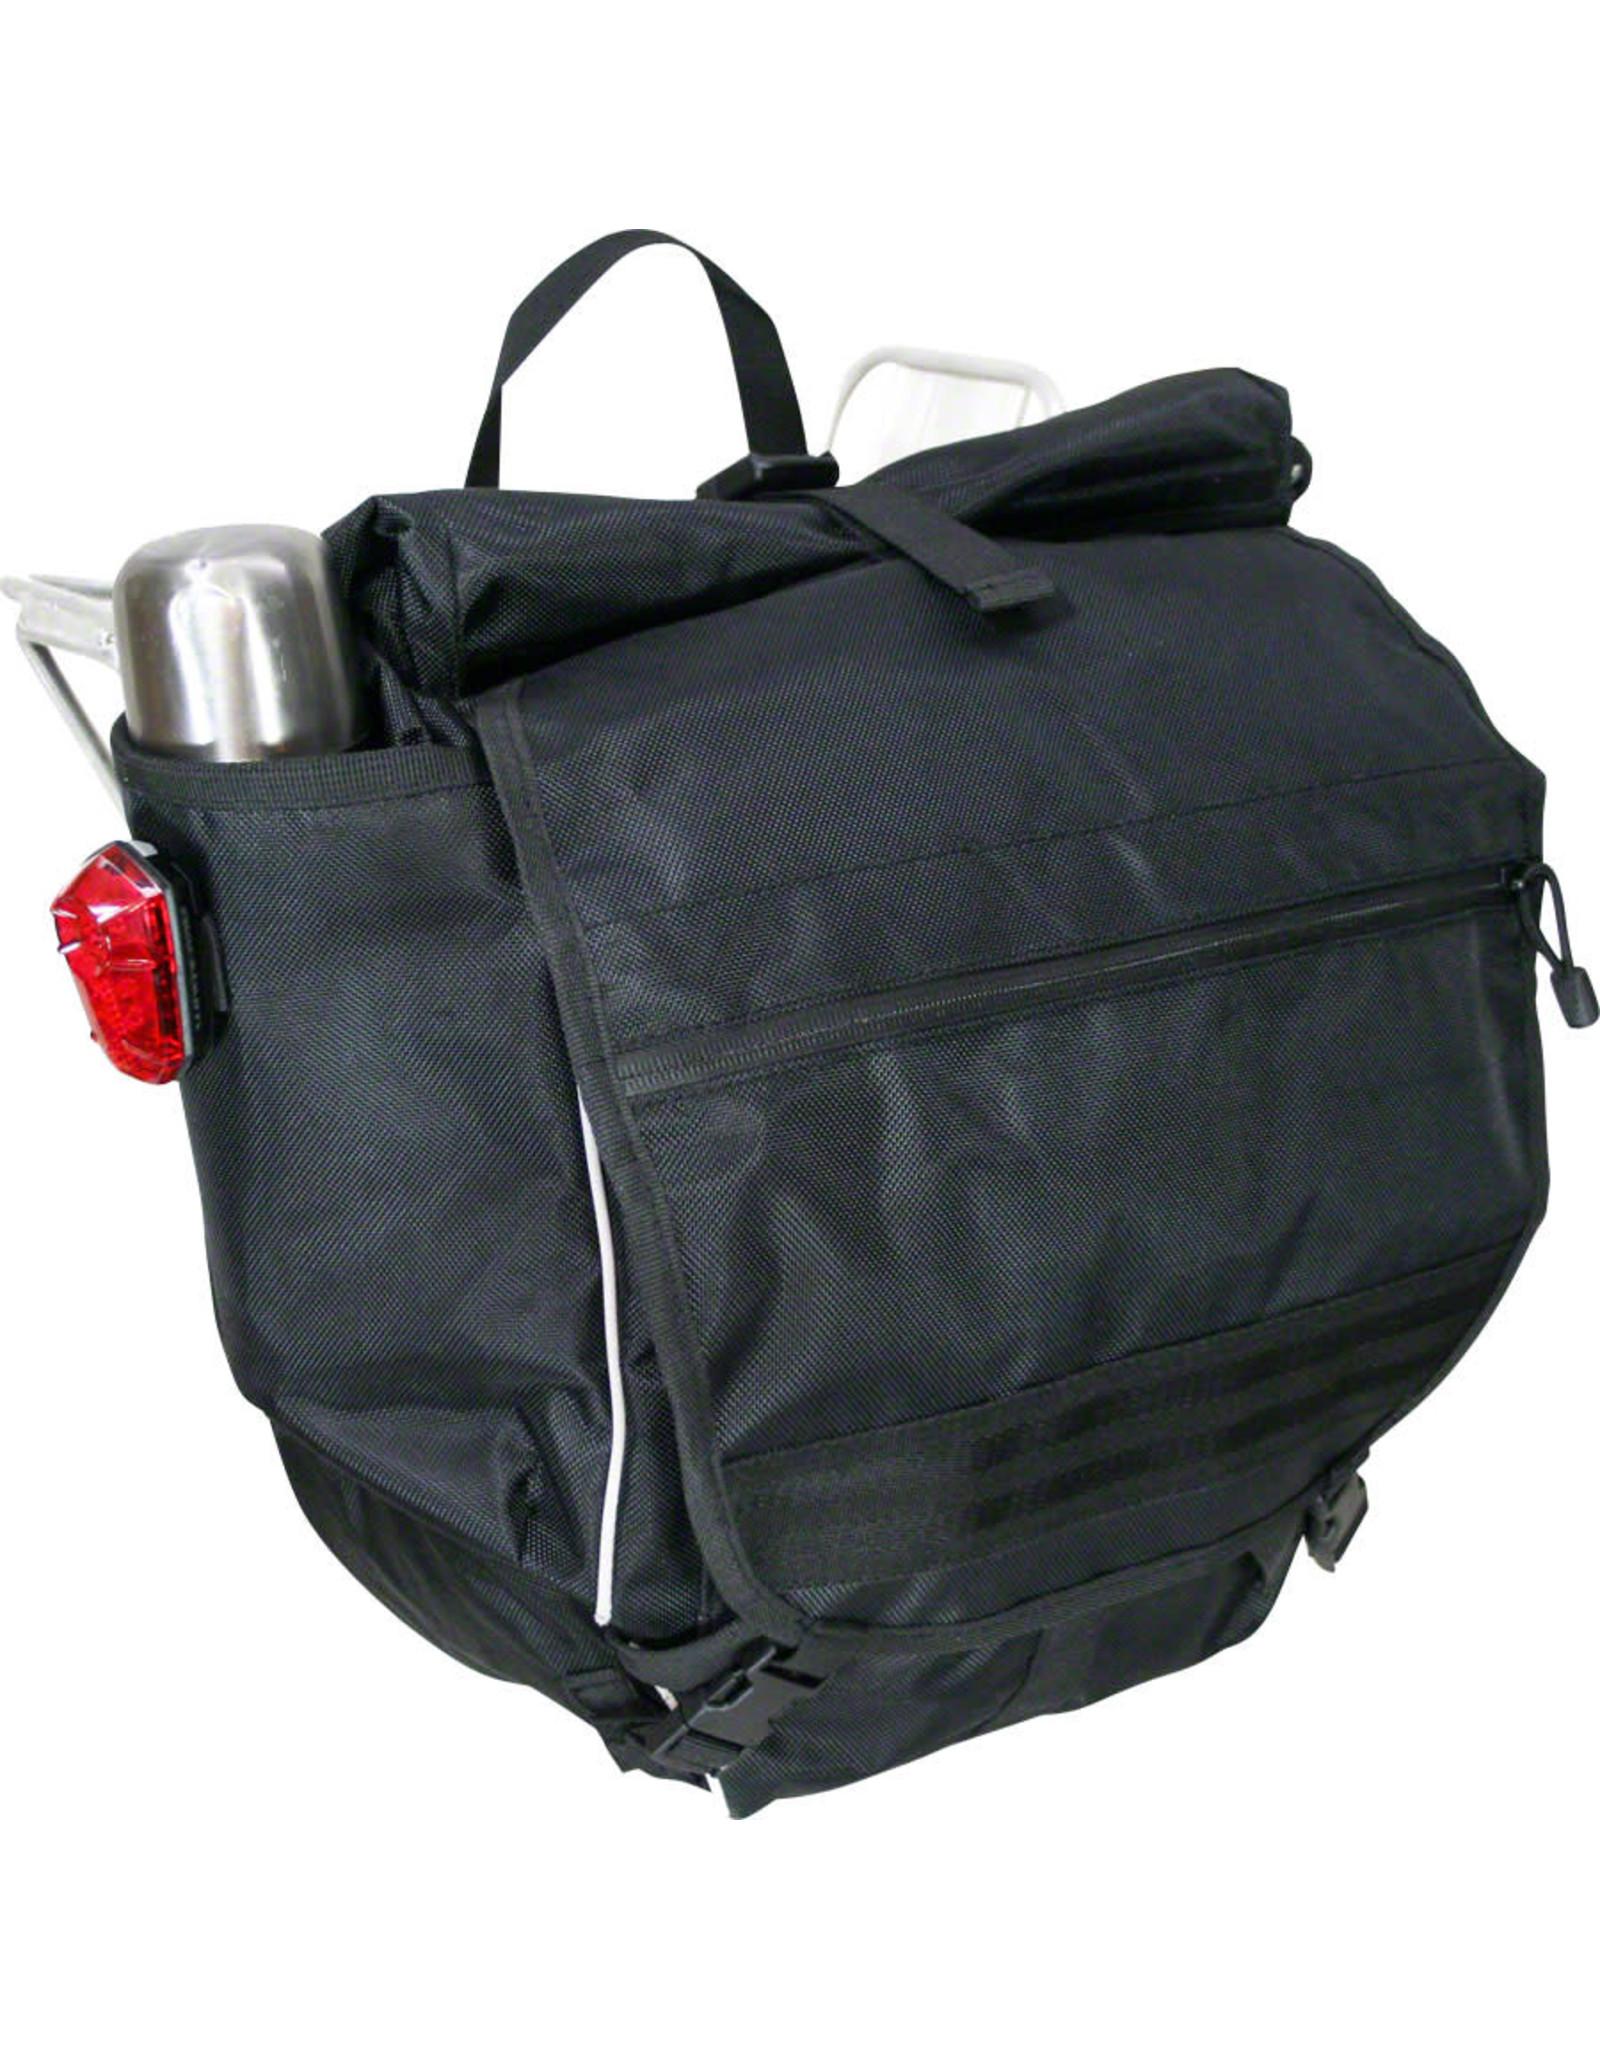 Banjo Brothers Banjo Brothers Waterproof Backpack Pannier: Black